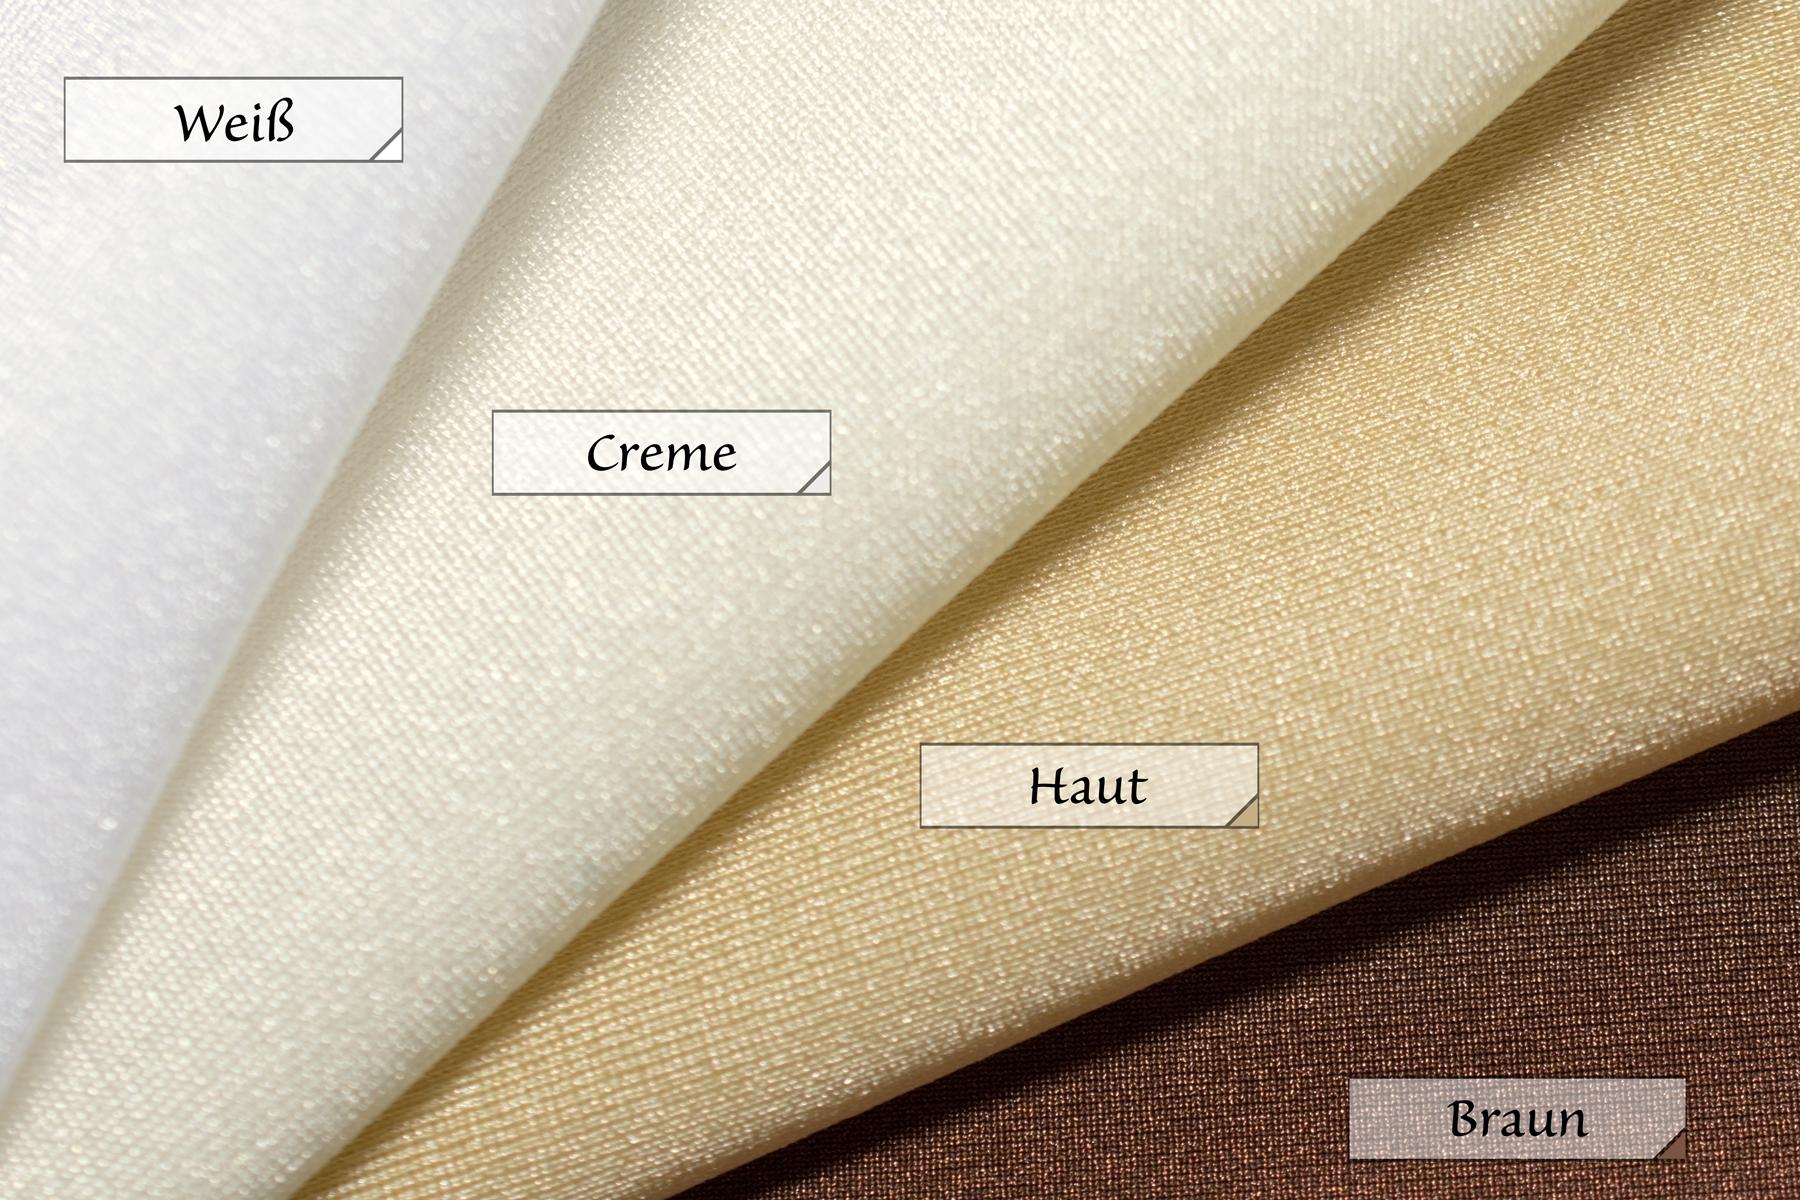 Stoff Jersey Weiß Creme Haut Braun 80% Polyamid 20% Elasthan